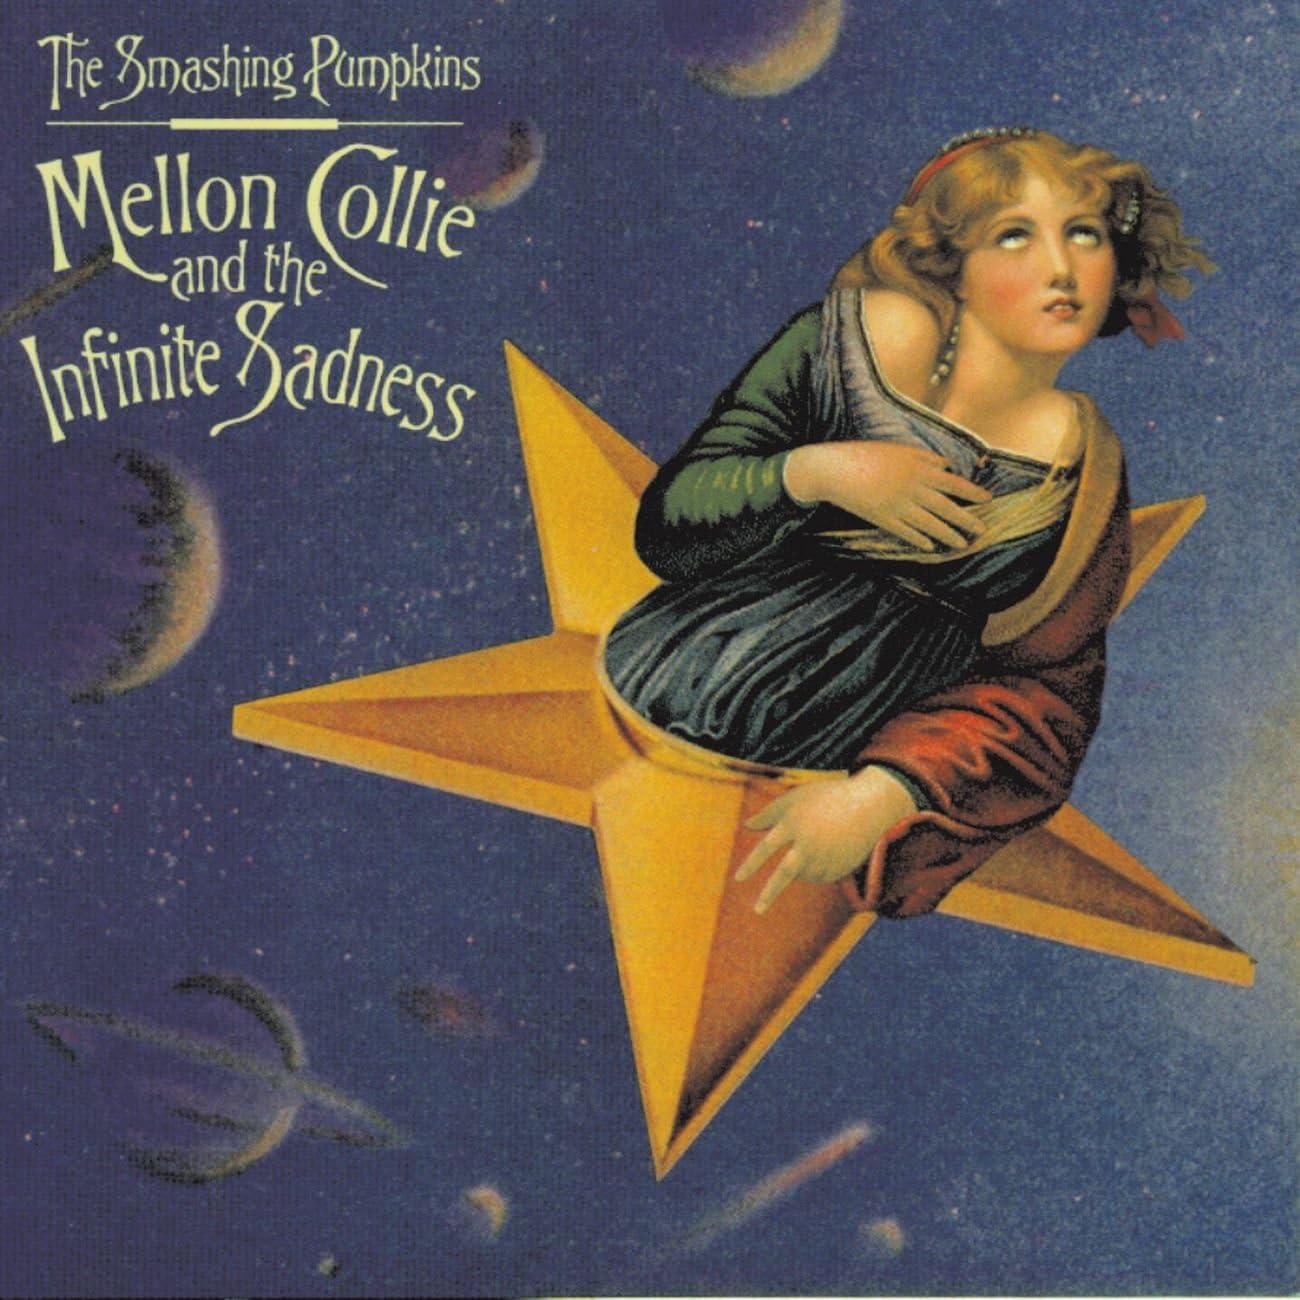 Mellon Collie and the Infinite Sadness: Amazon.co.uk: Music